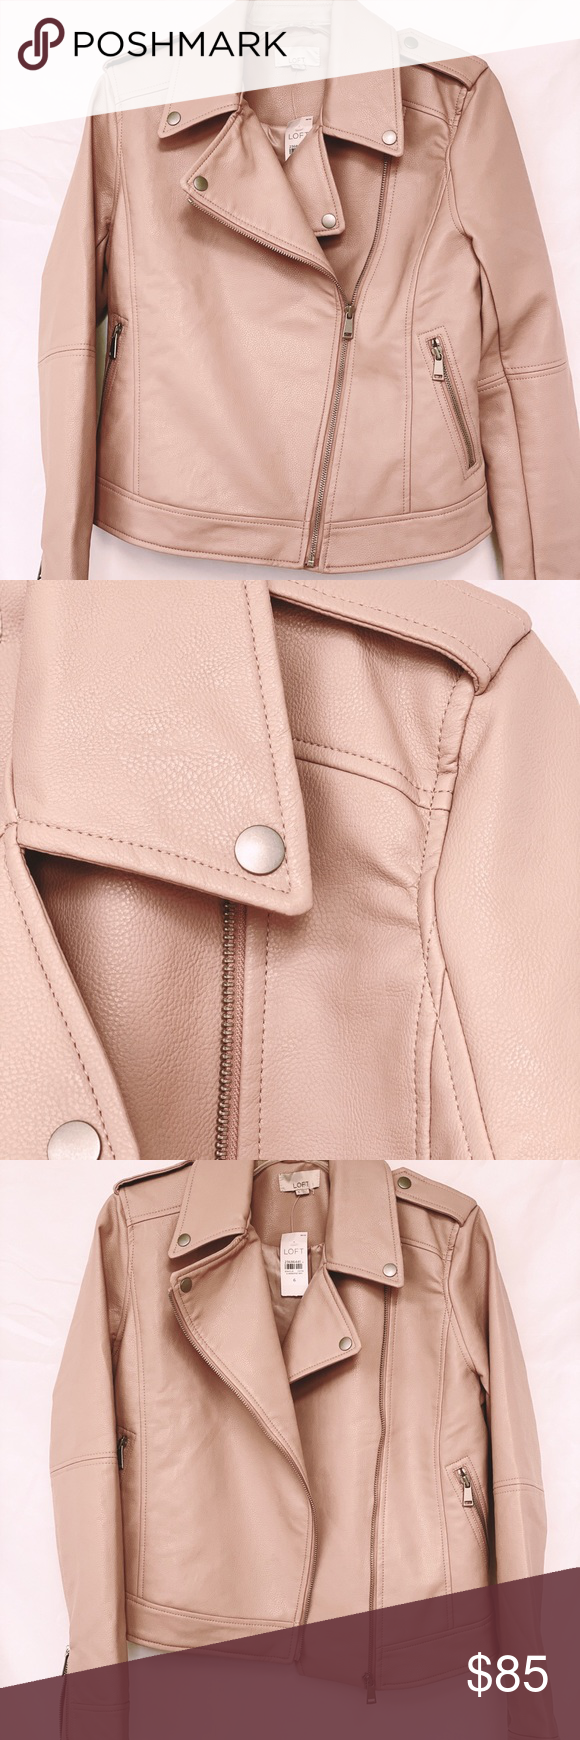 Nwt Ann Taylor Loft Faux Leather Moto Jacket Nwt Blush Pink Faux Leather Moto Jacket No Visible Flaws Faux Leather Moto Jacket Leather Moto Jacket Moto Style